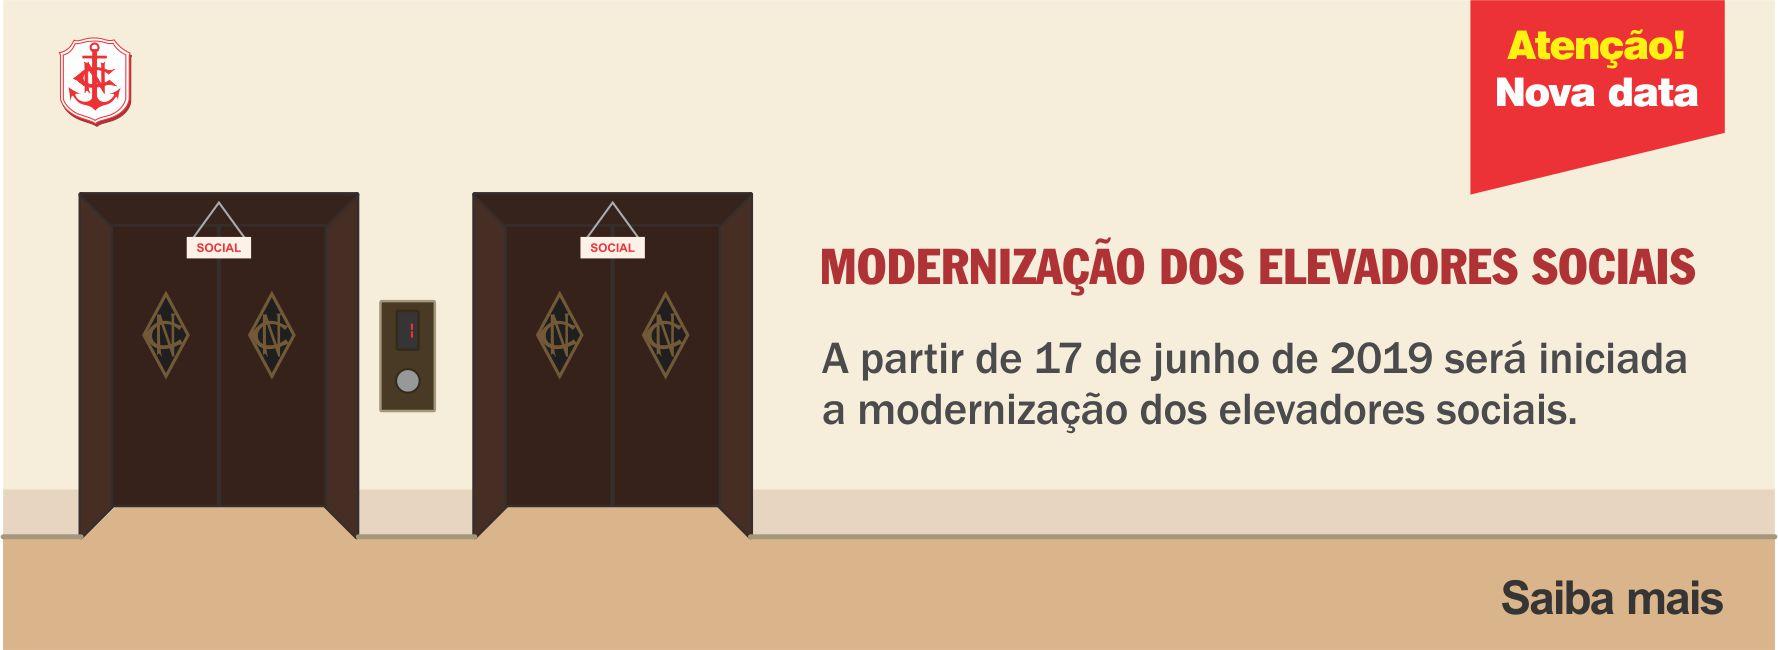 https://www.clubenaval.org.br/novo/moderniza%C3%A7%C3%A3o-dos-elevadores-sociais-1